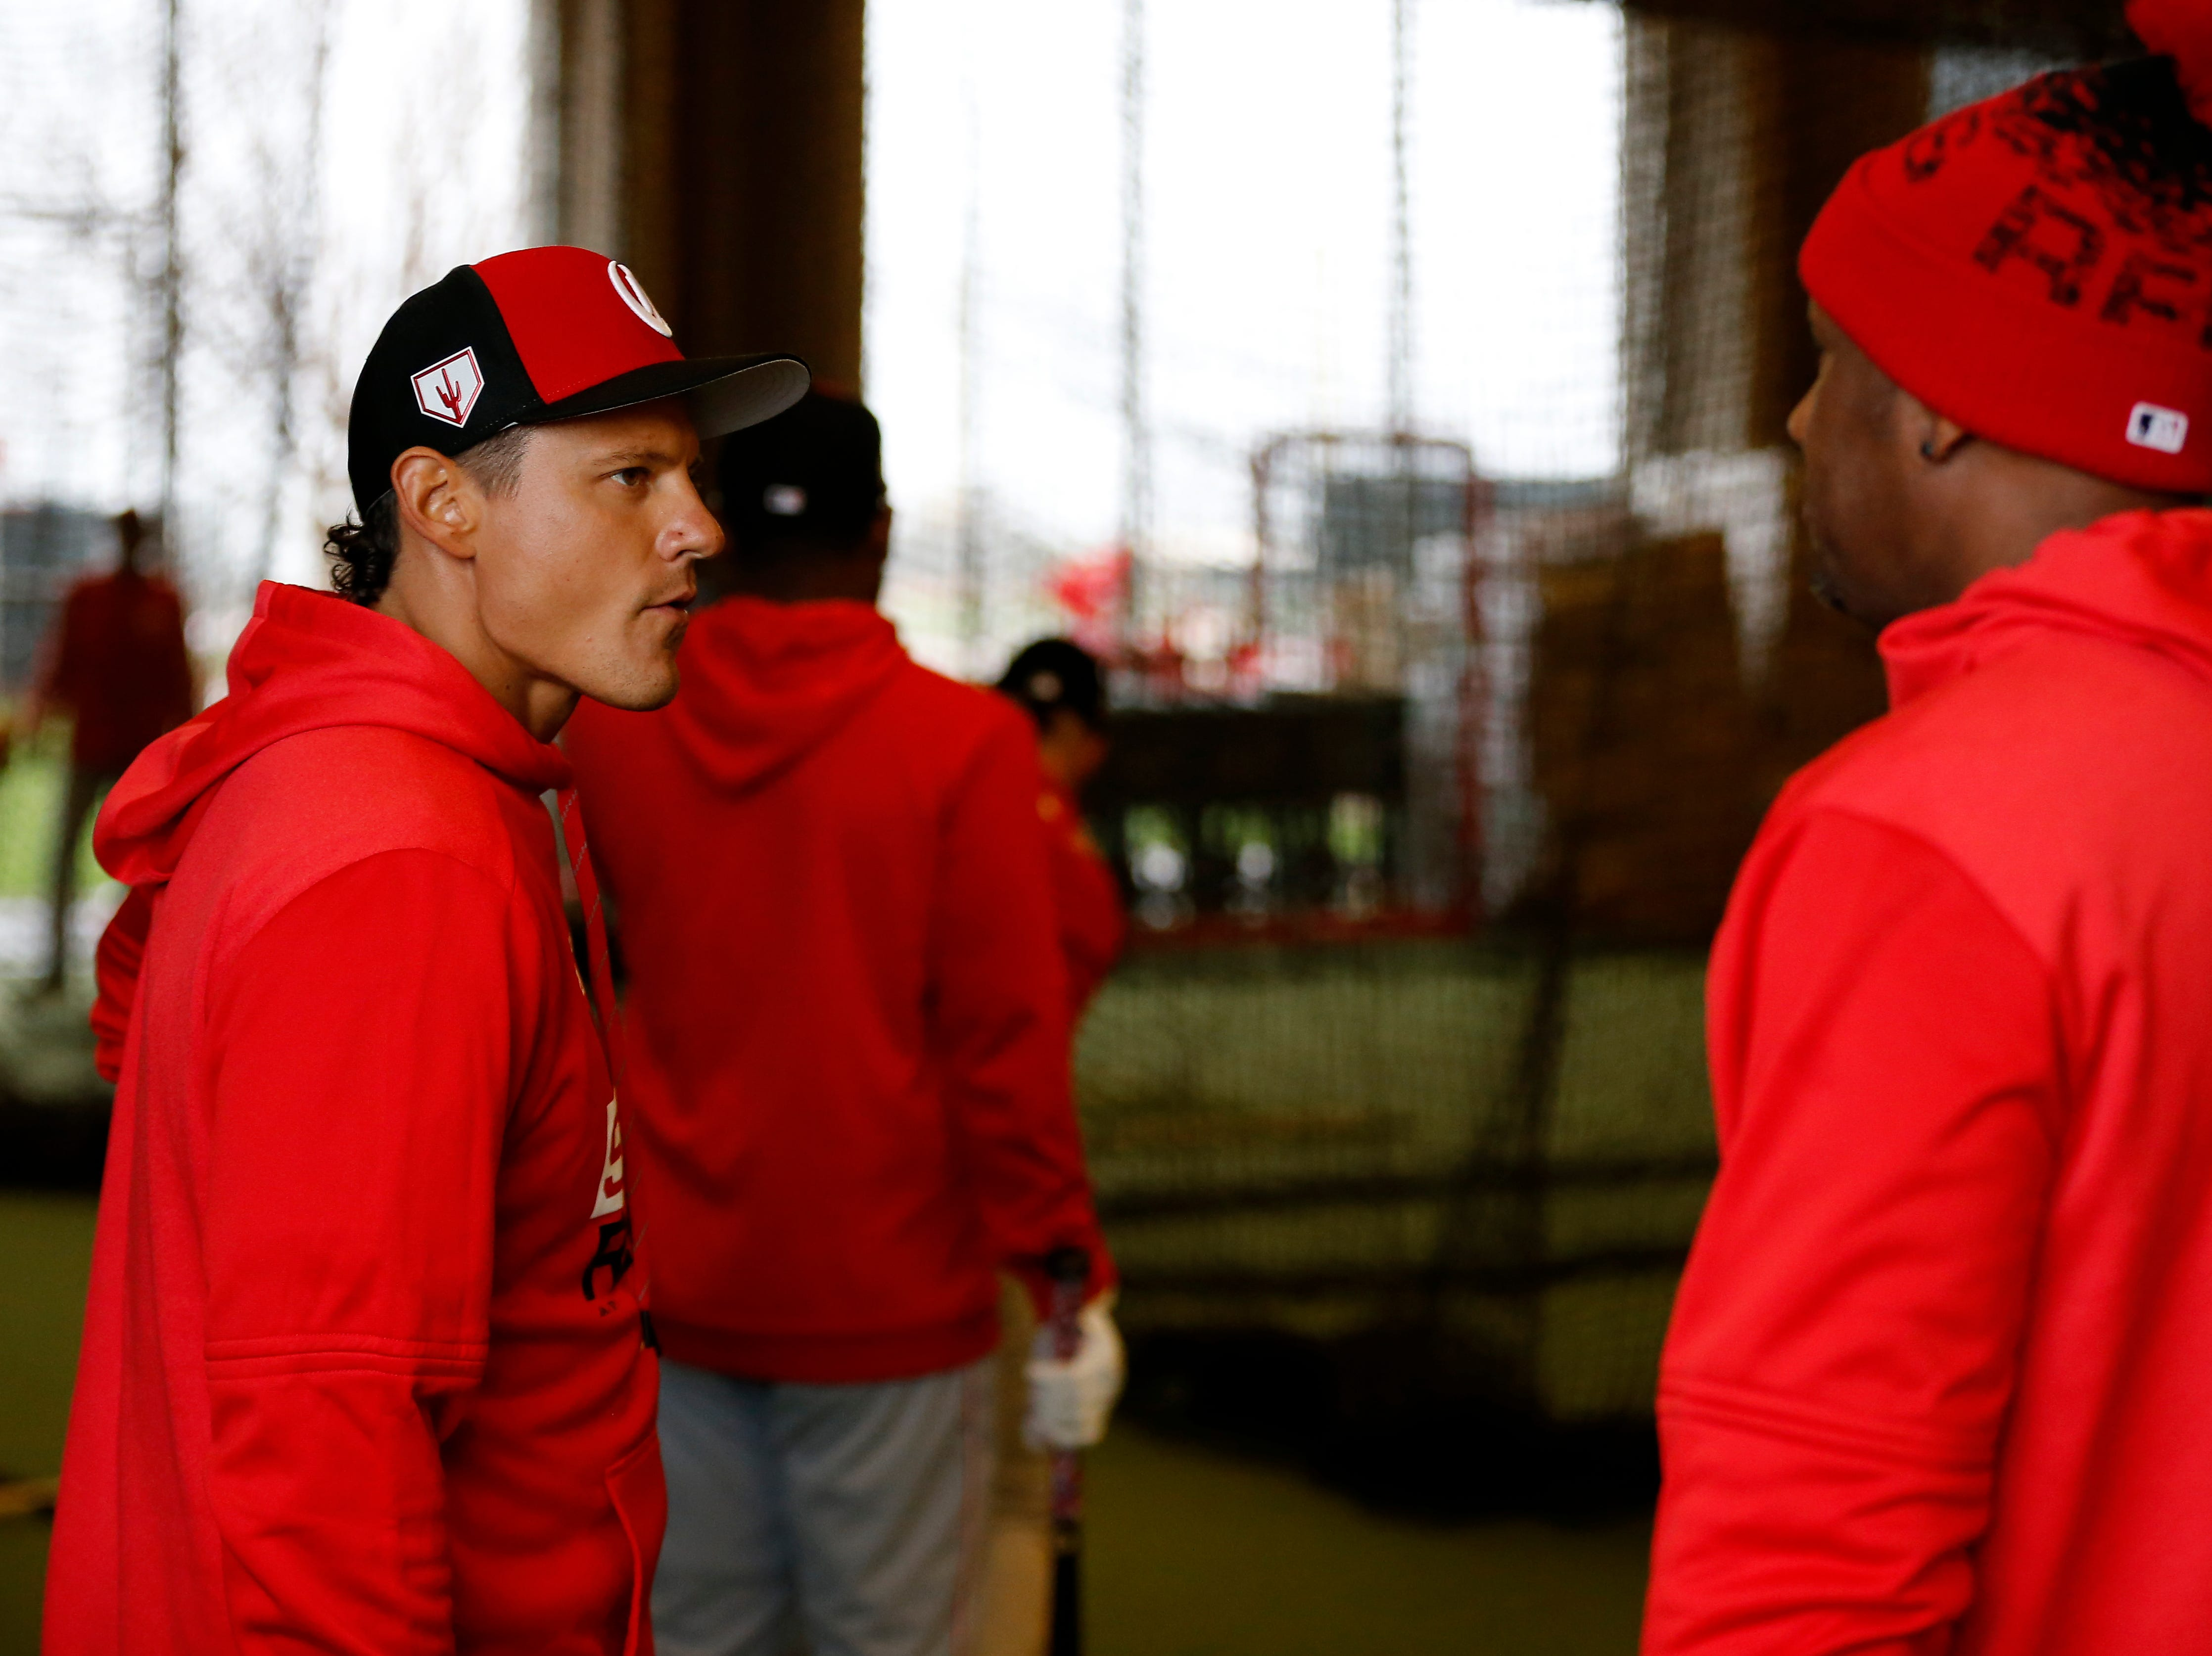 Cincinnati Reds new signee Derek Dietrich talks with Eric Davis at the Cincinnati Reds spring training facility in Goodyear, Ariz., on Thursday, Feb. 21, 2019.